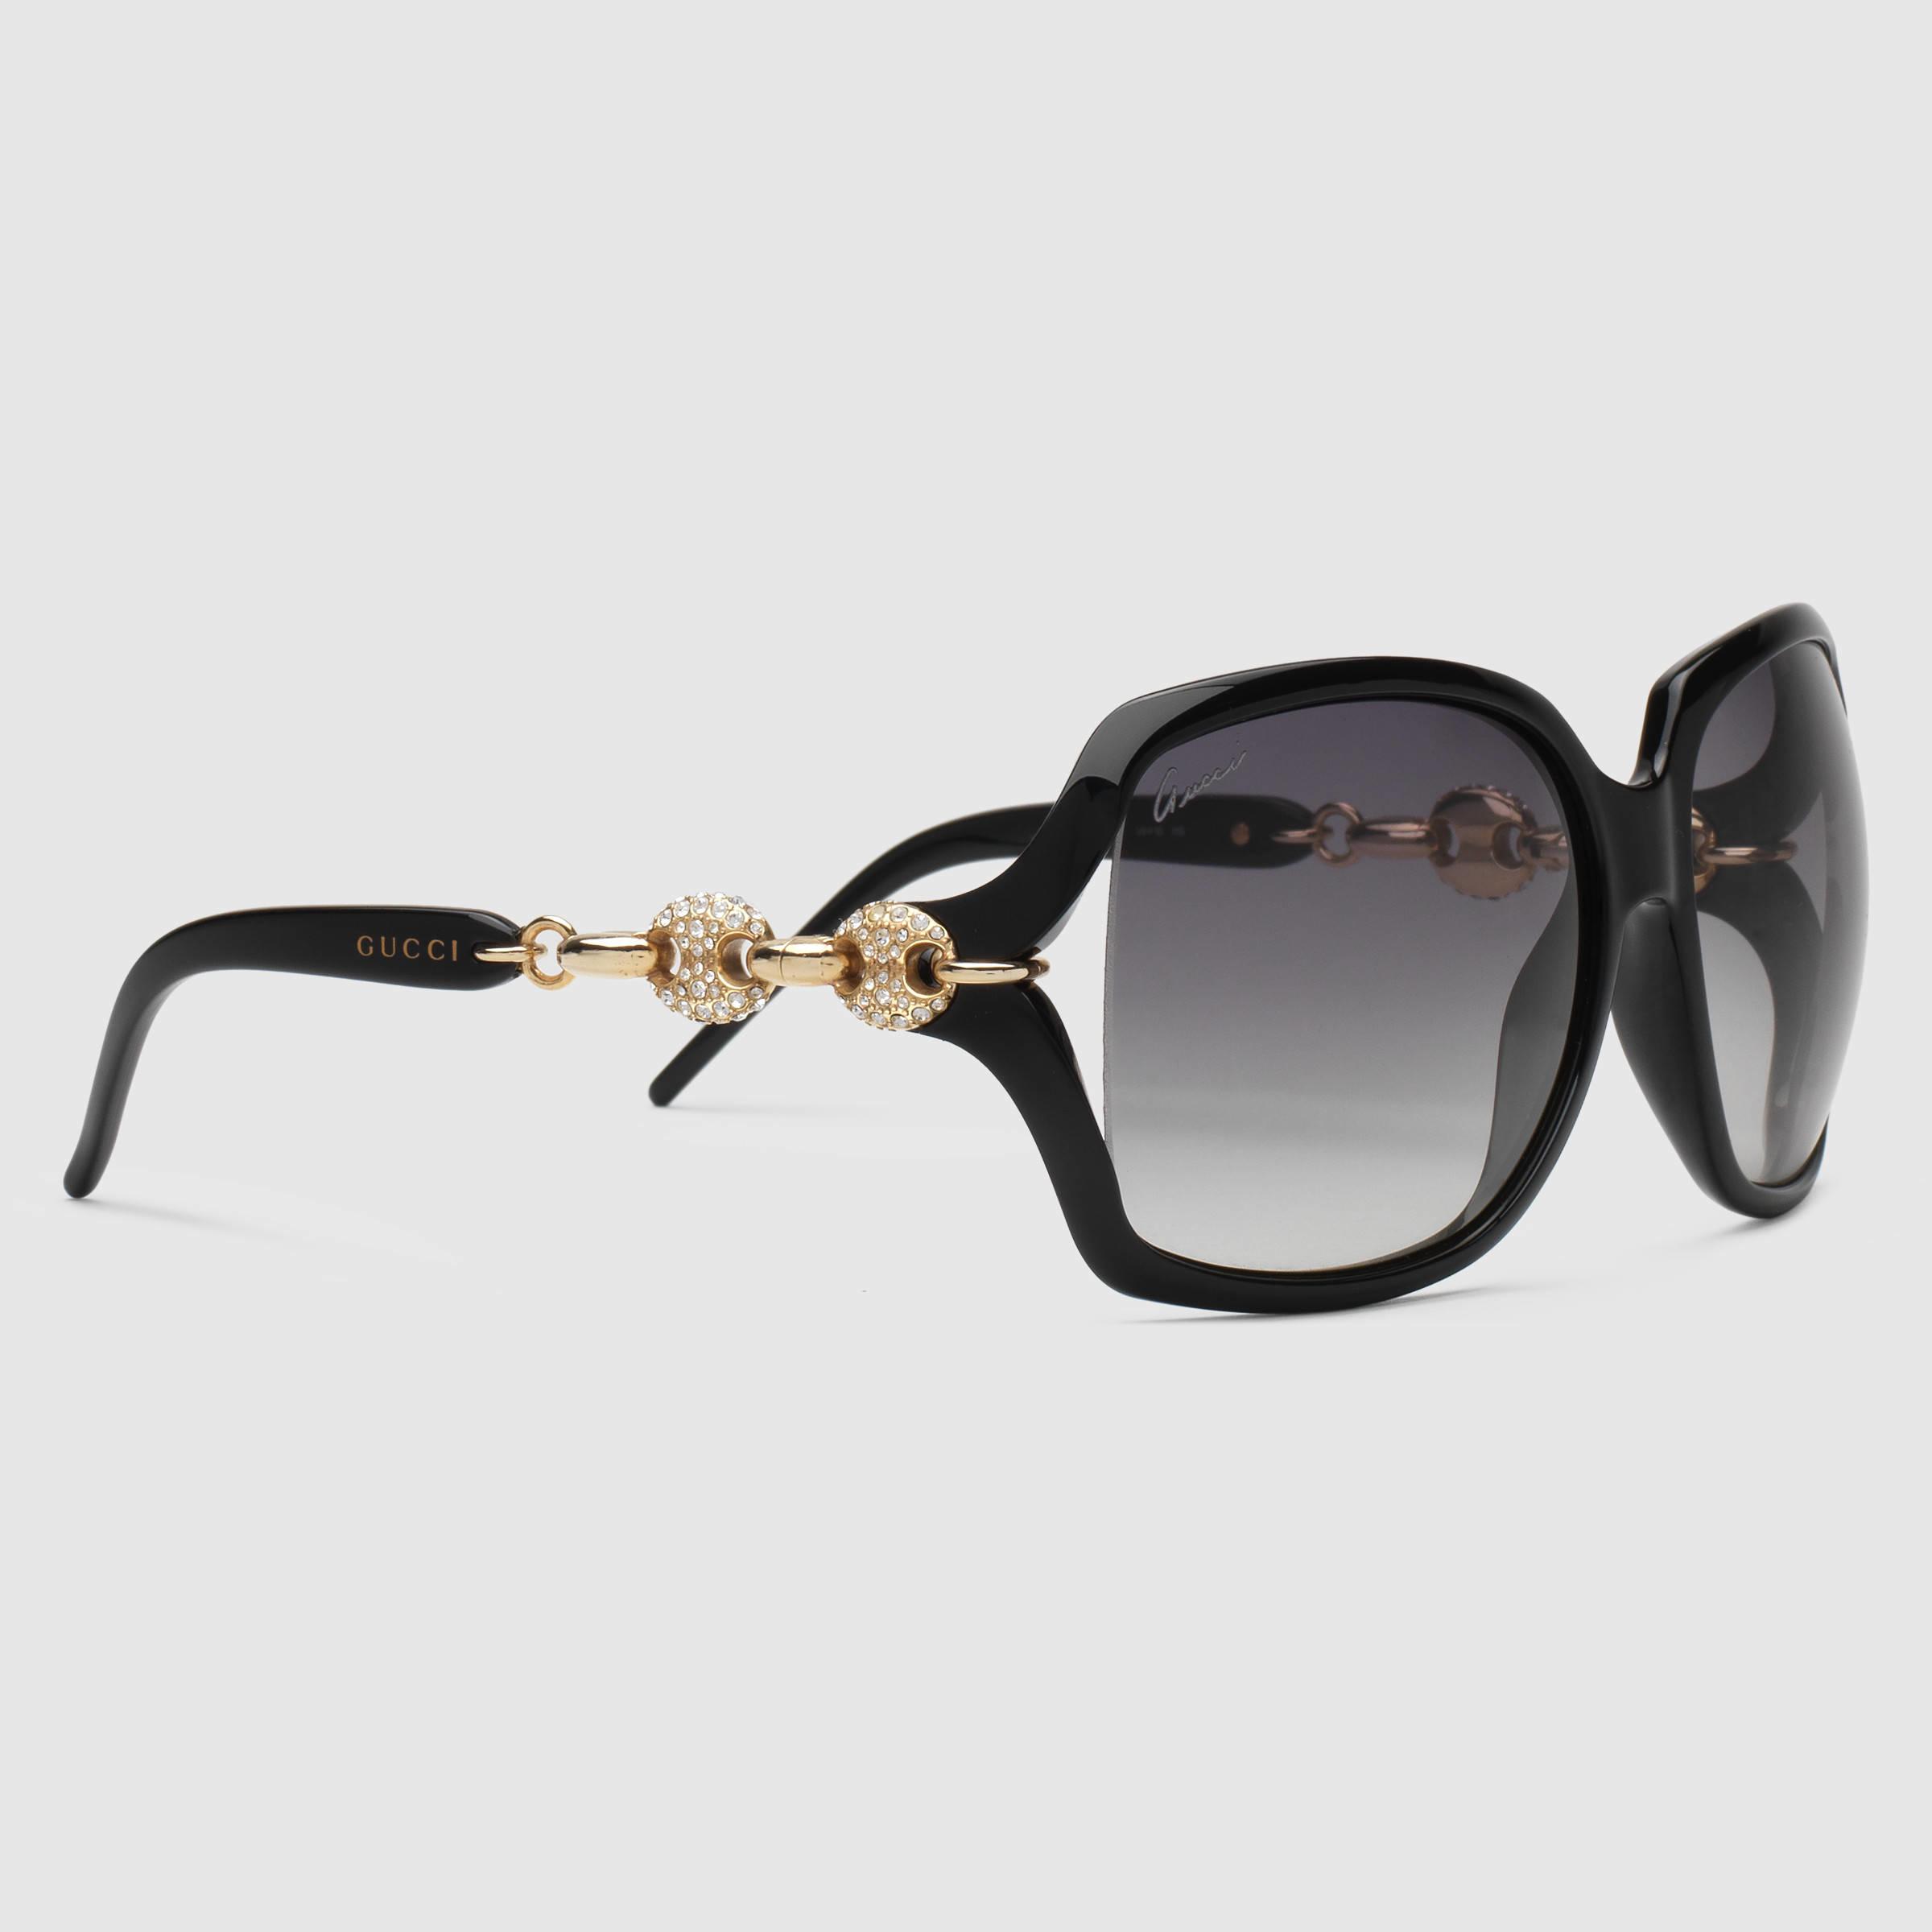 a60f8e117c Gucci Women s Marina Chain Polarized Aviator Sunglasses - Bitterroot ...